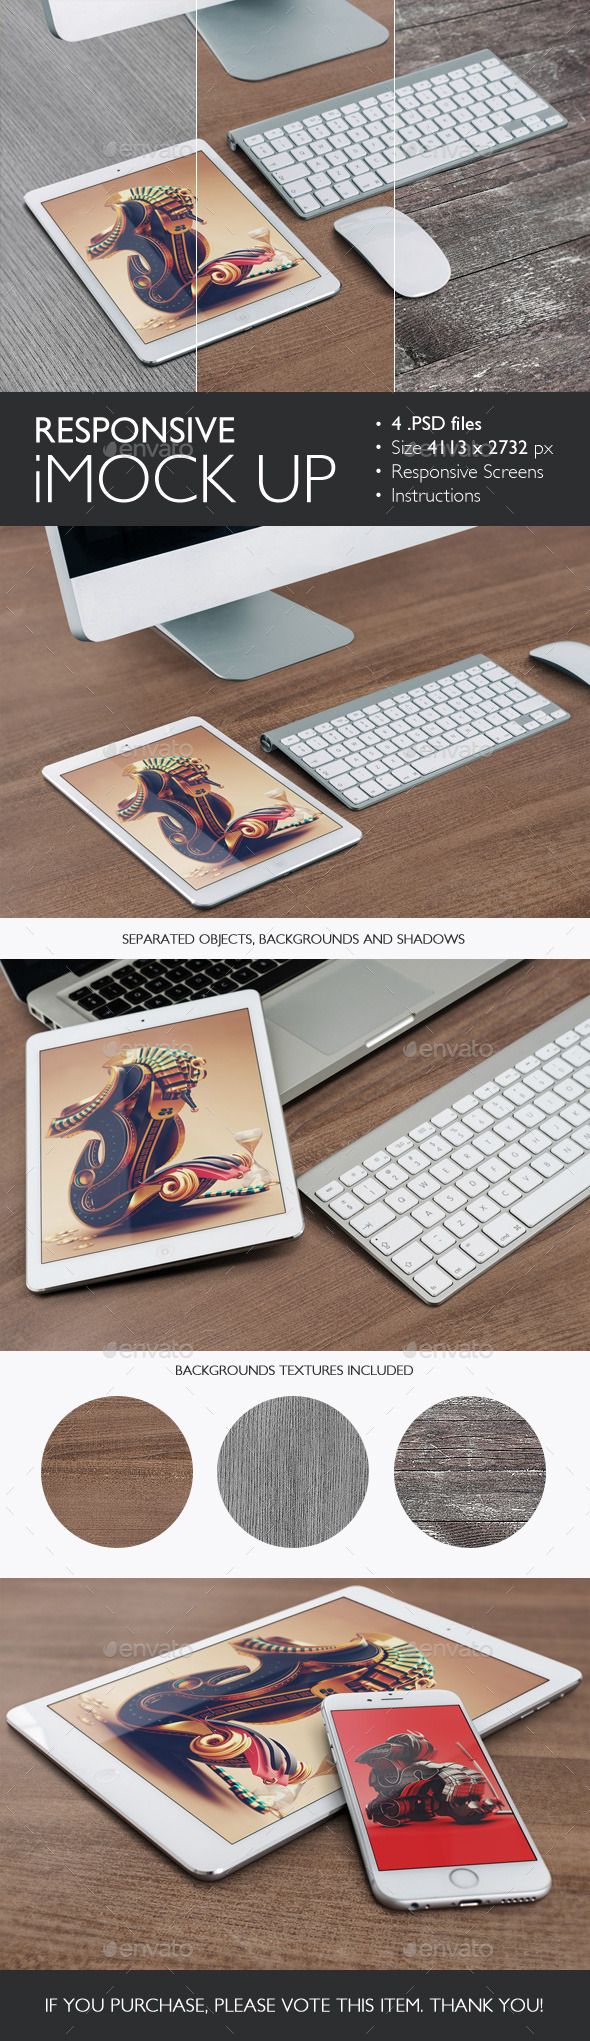 Responsive iMock Up - Product Mock-Ups Graphics